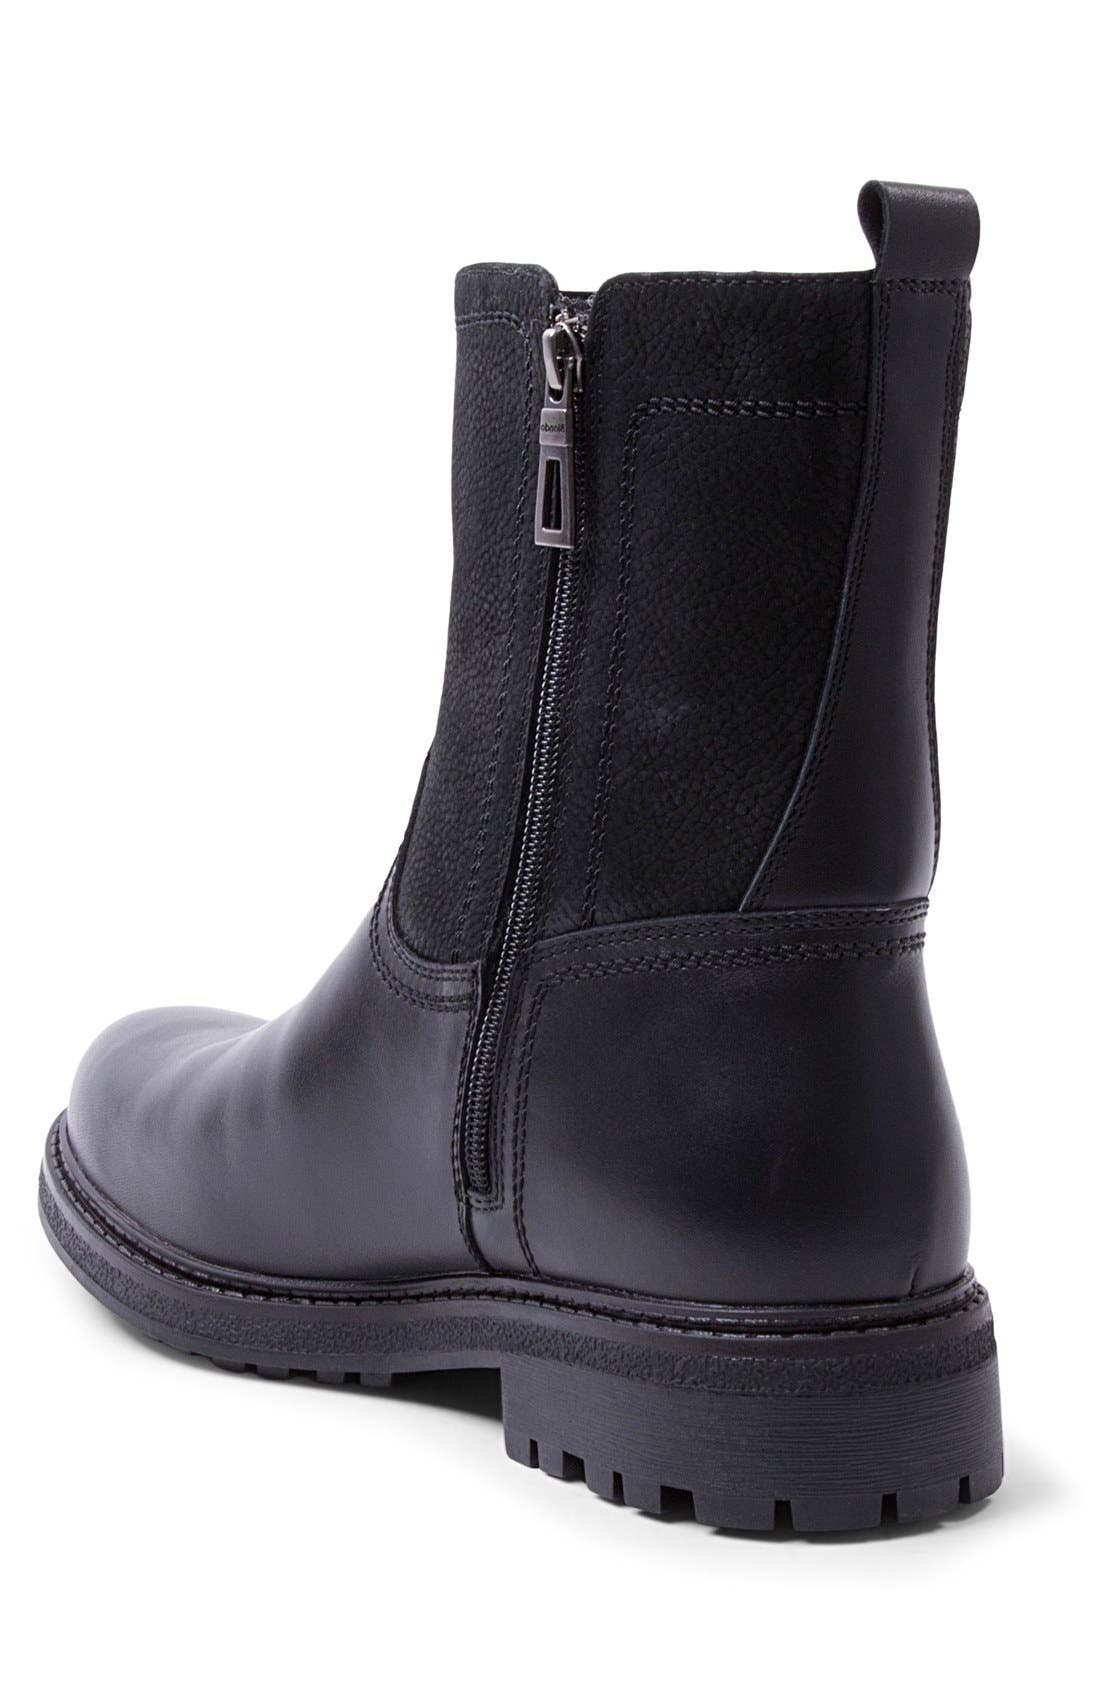 'Jagger' Waterproof Zip Boot,                             Alternate thumbnail 2, color,                             001